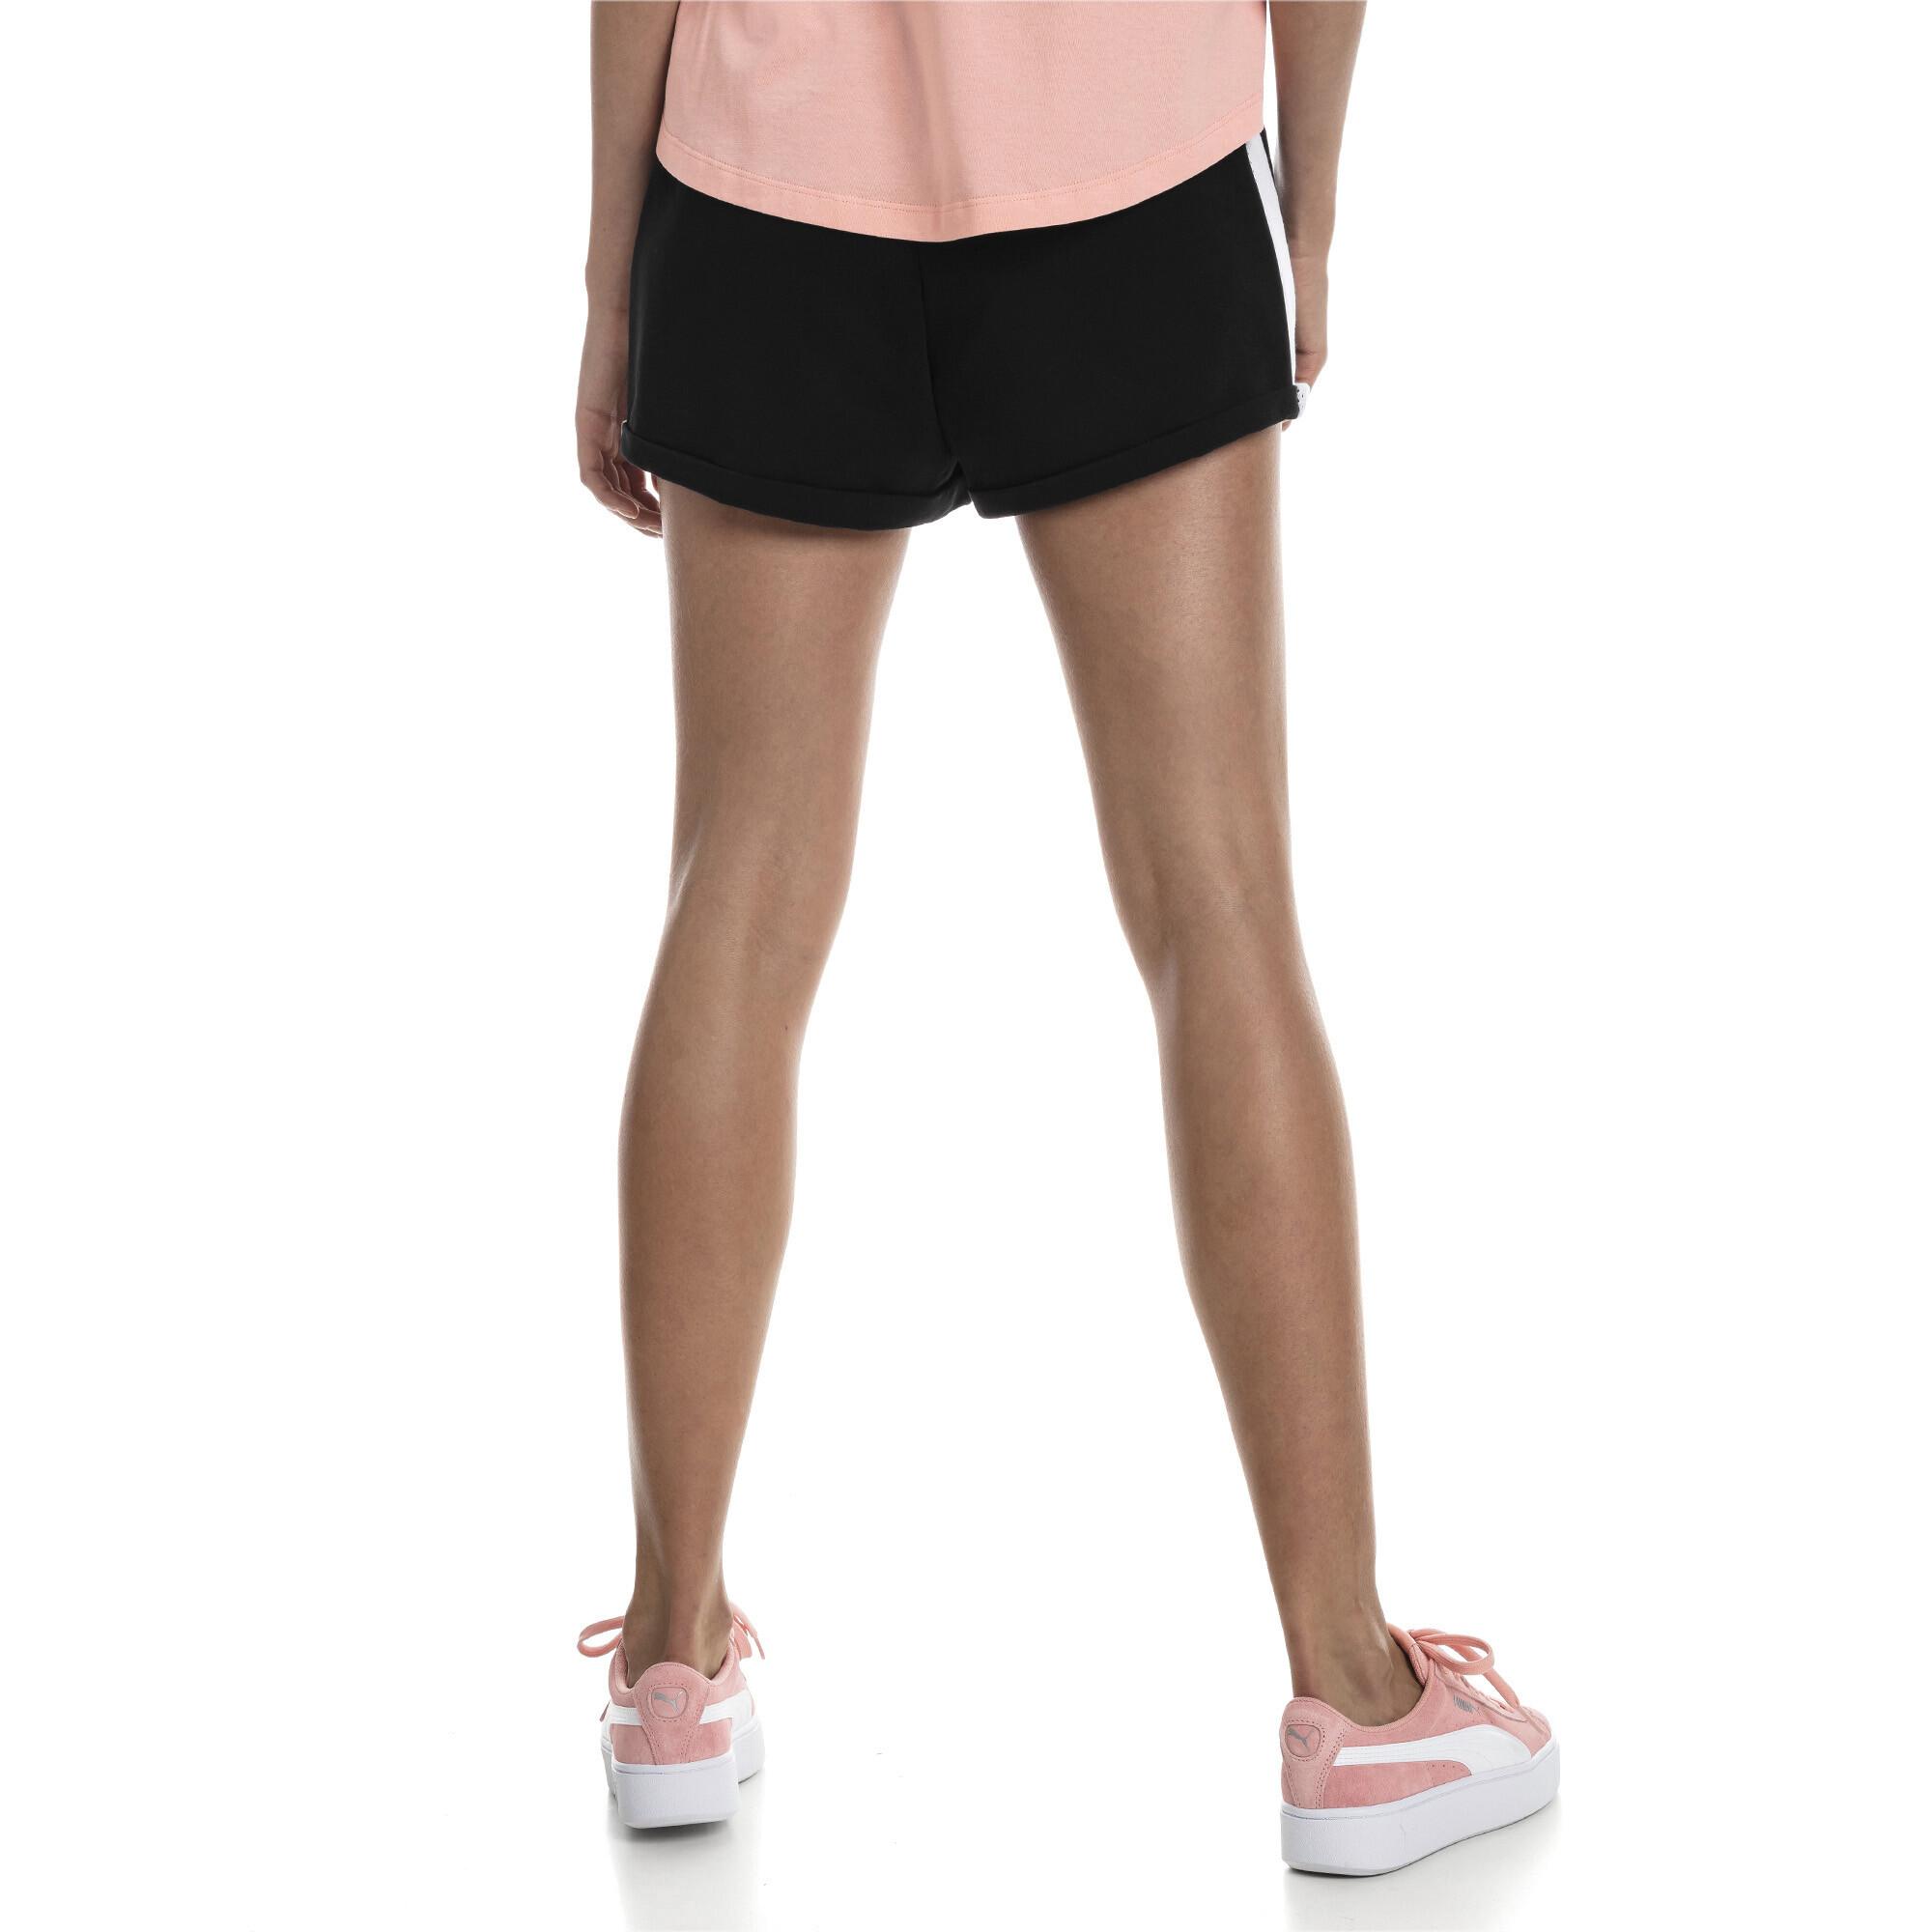 PUMA-Modern-Sports-Damen-Shorts-Frauen-Shorts-Basics-Neu Indexbild 5